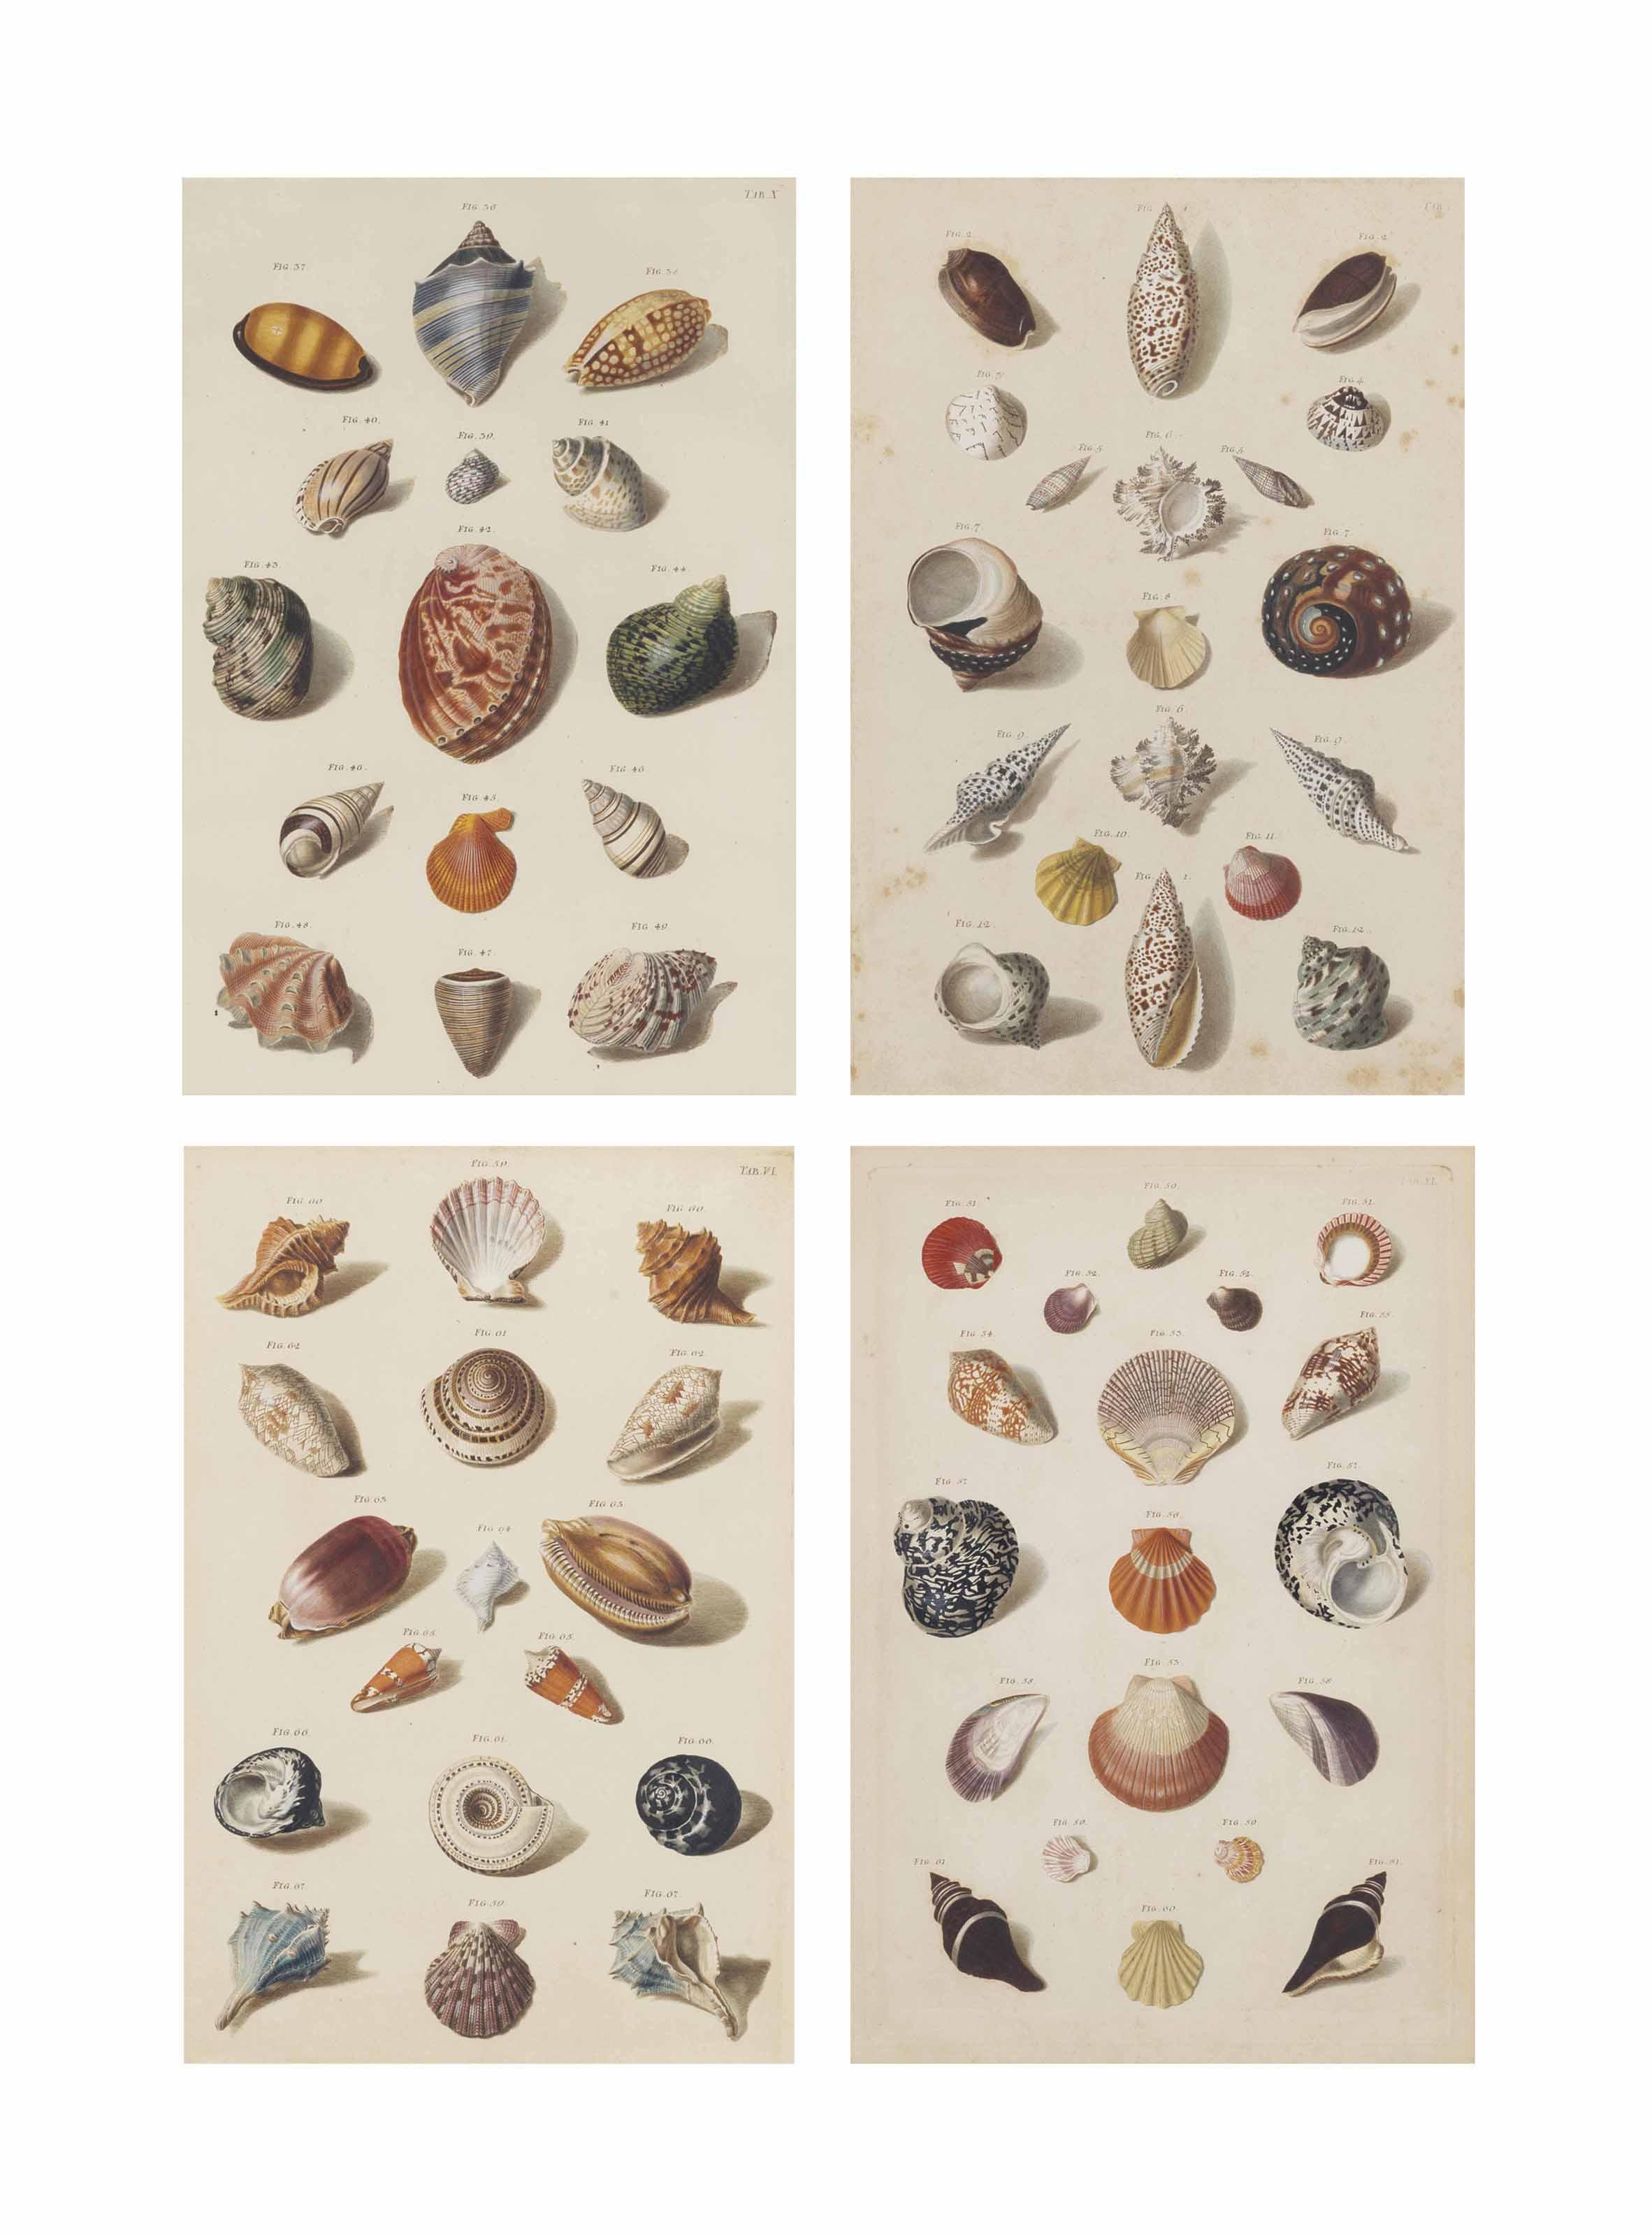 FRANZ MICHAEL REGENFUSS (1712-